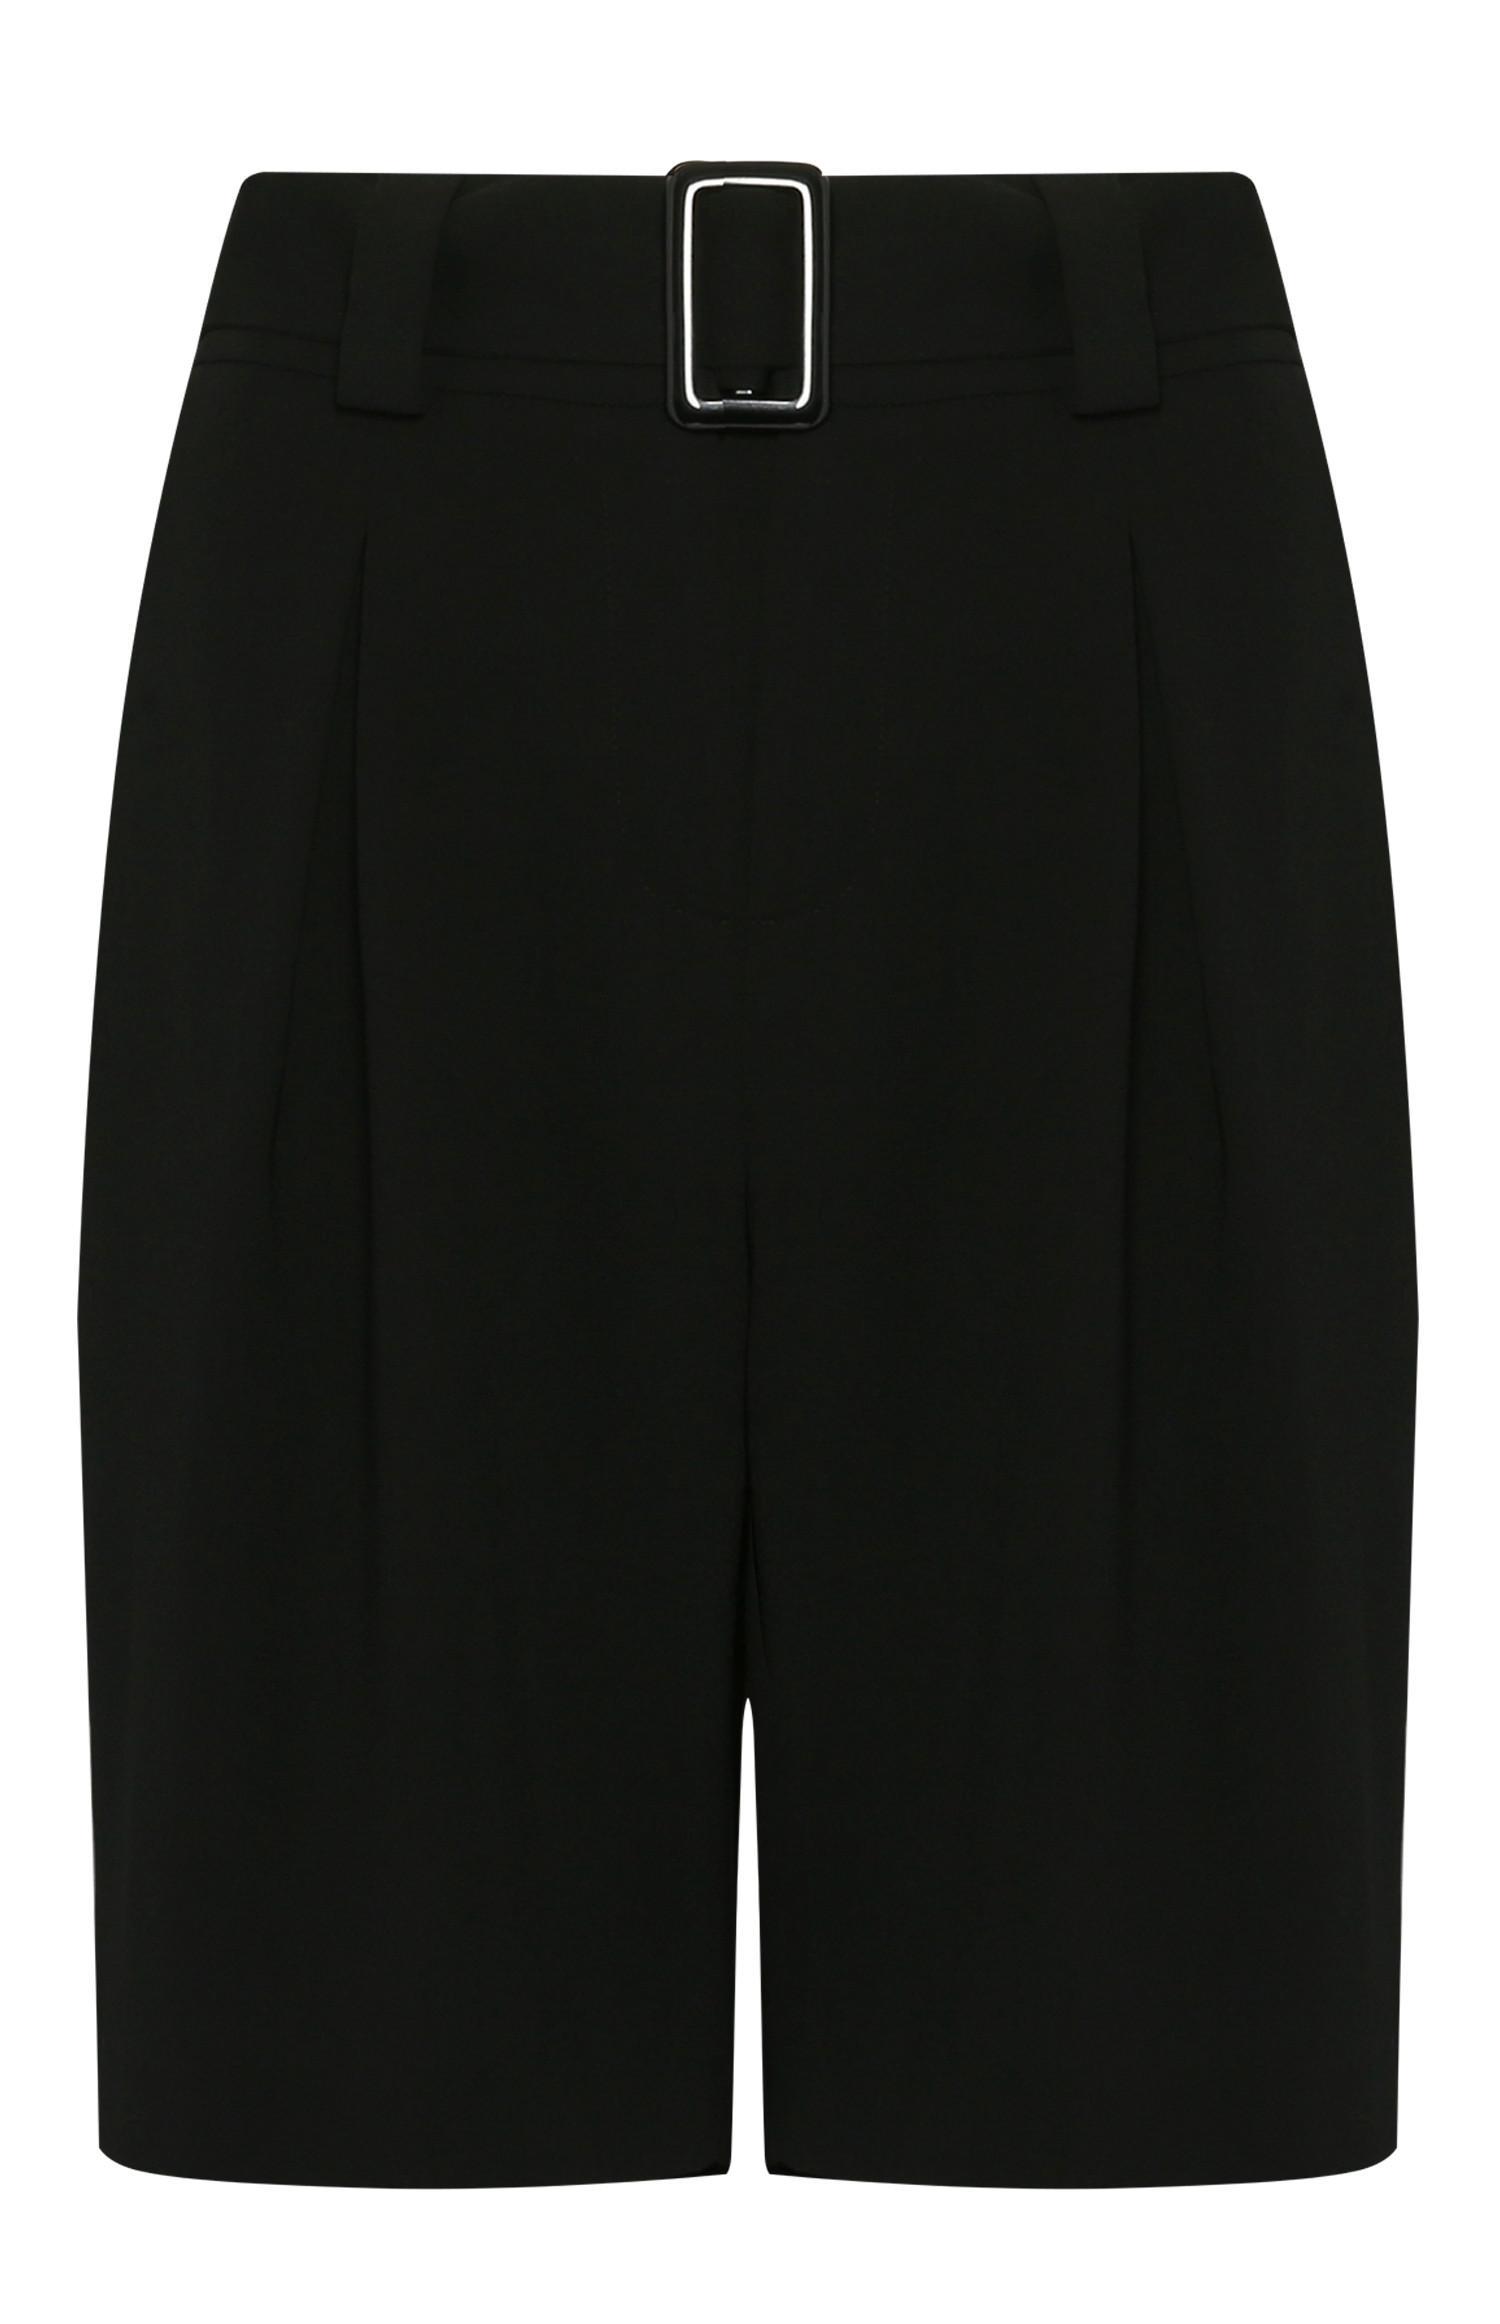 Pantalón corto largo negro